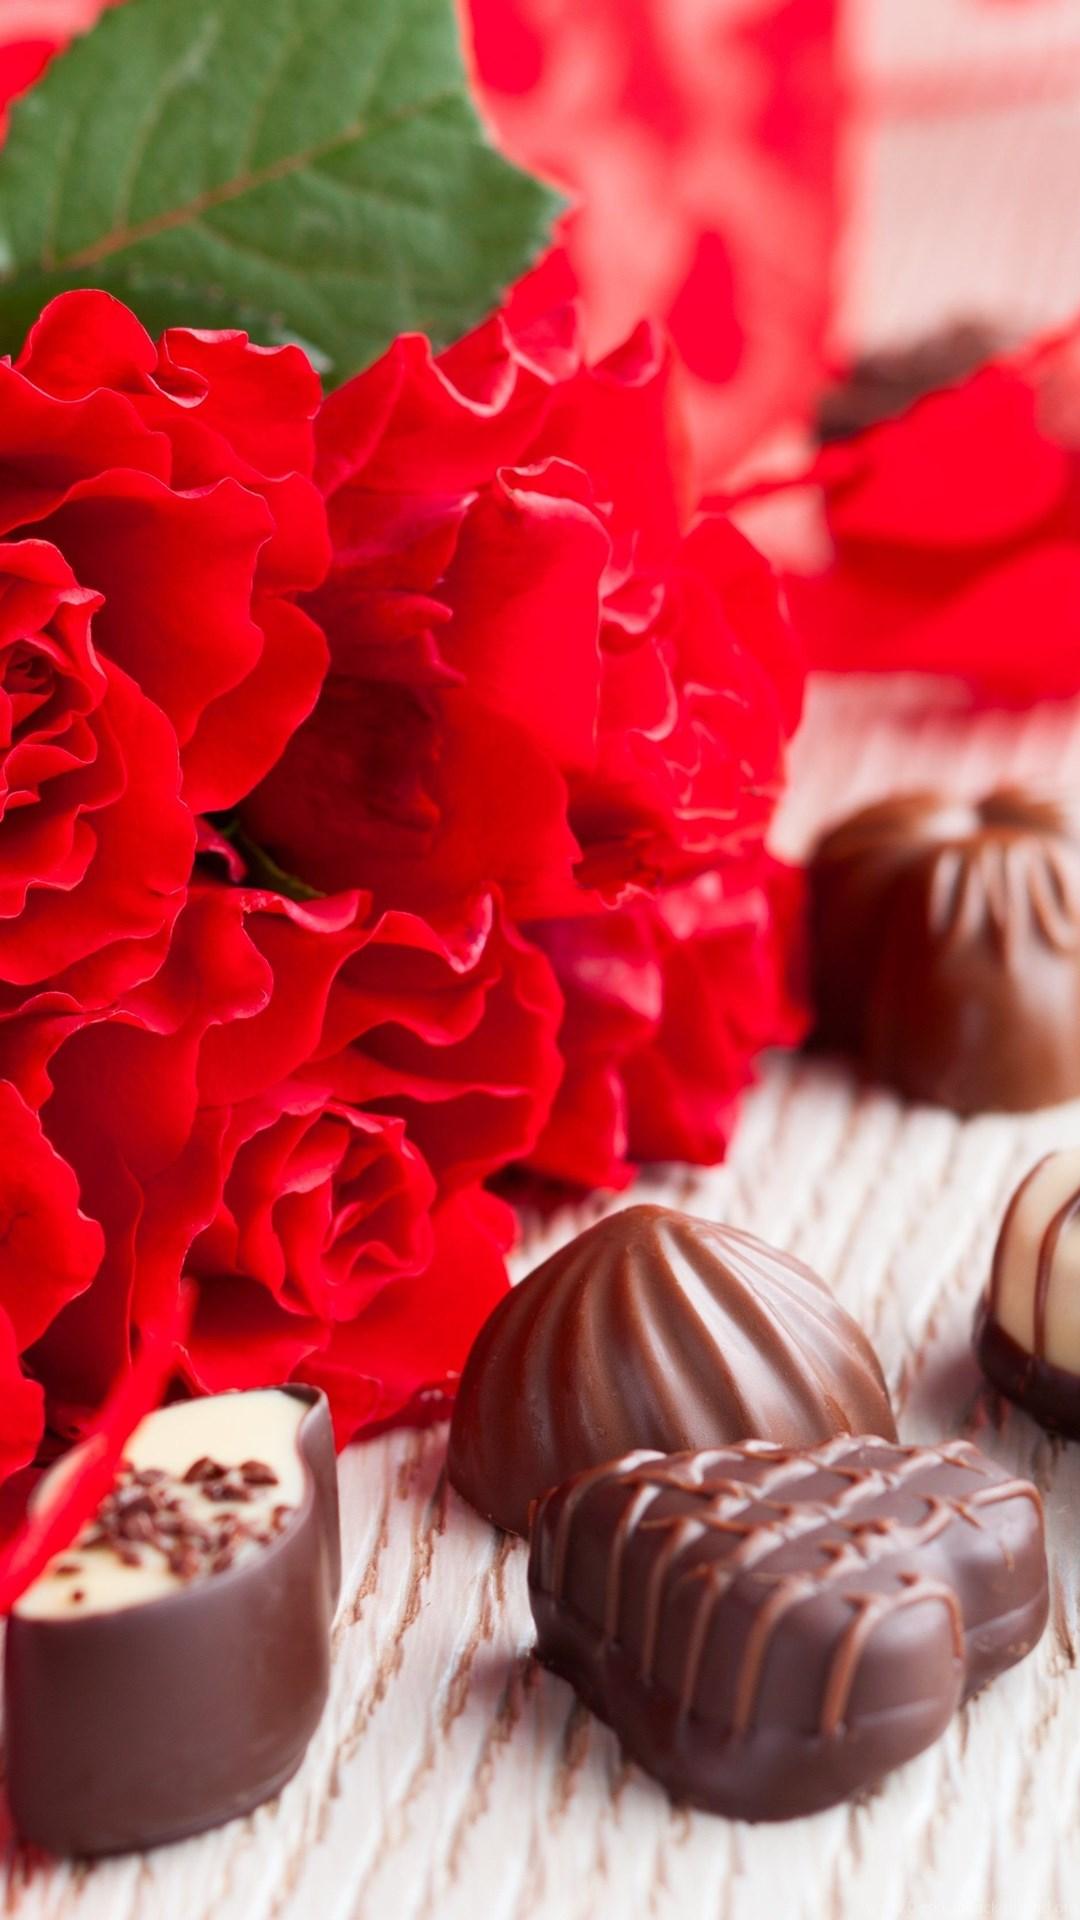 Rose Flowers Love Life Chocolate Presents Wallpapers Desktop Background